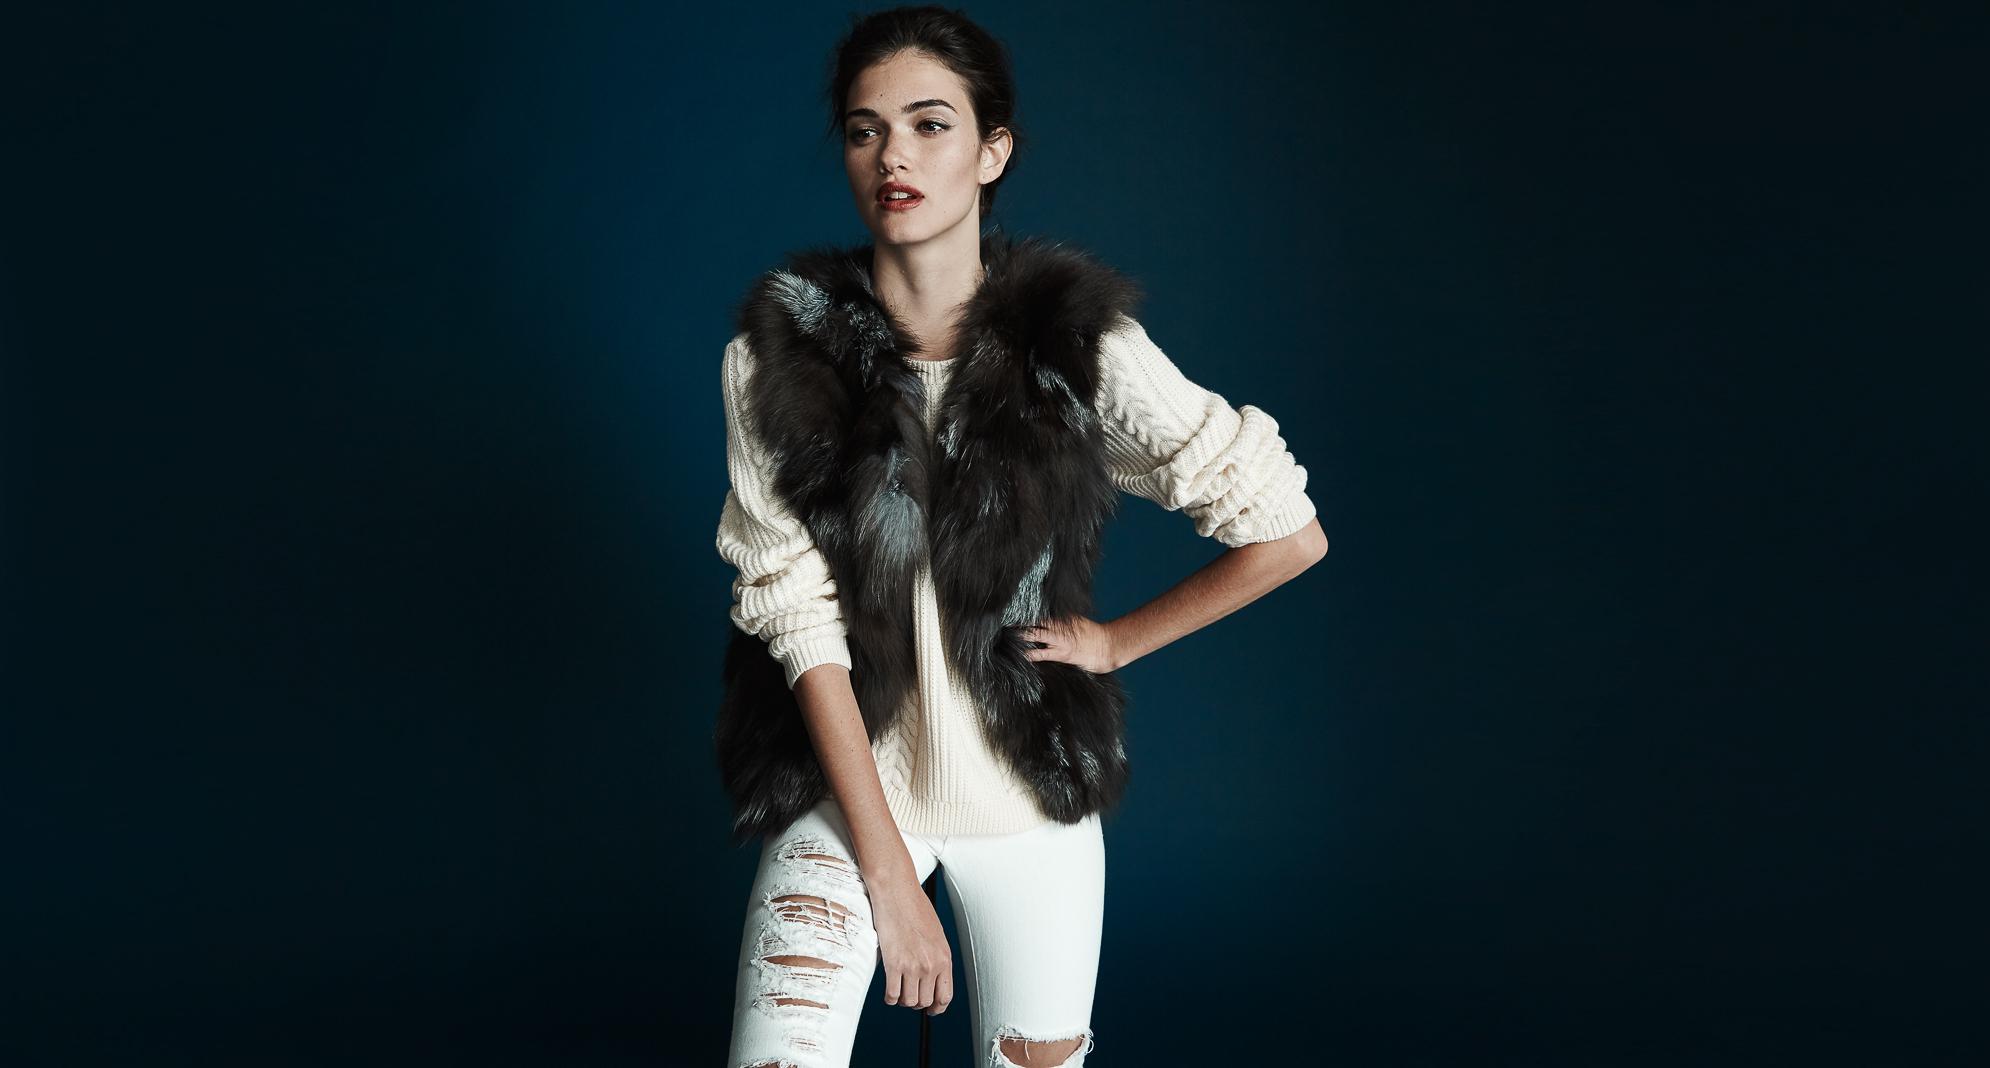 Introducing_Adrienne_Landau_Fur_WACC_OF_1117194504_EDITORIAL_575.jpg